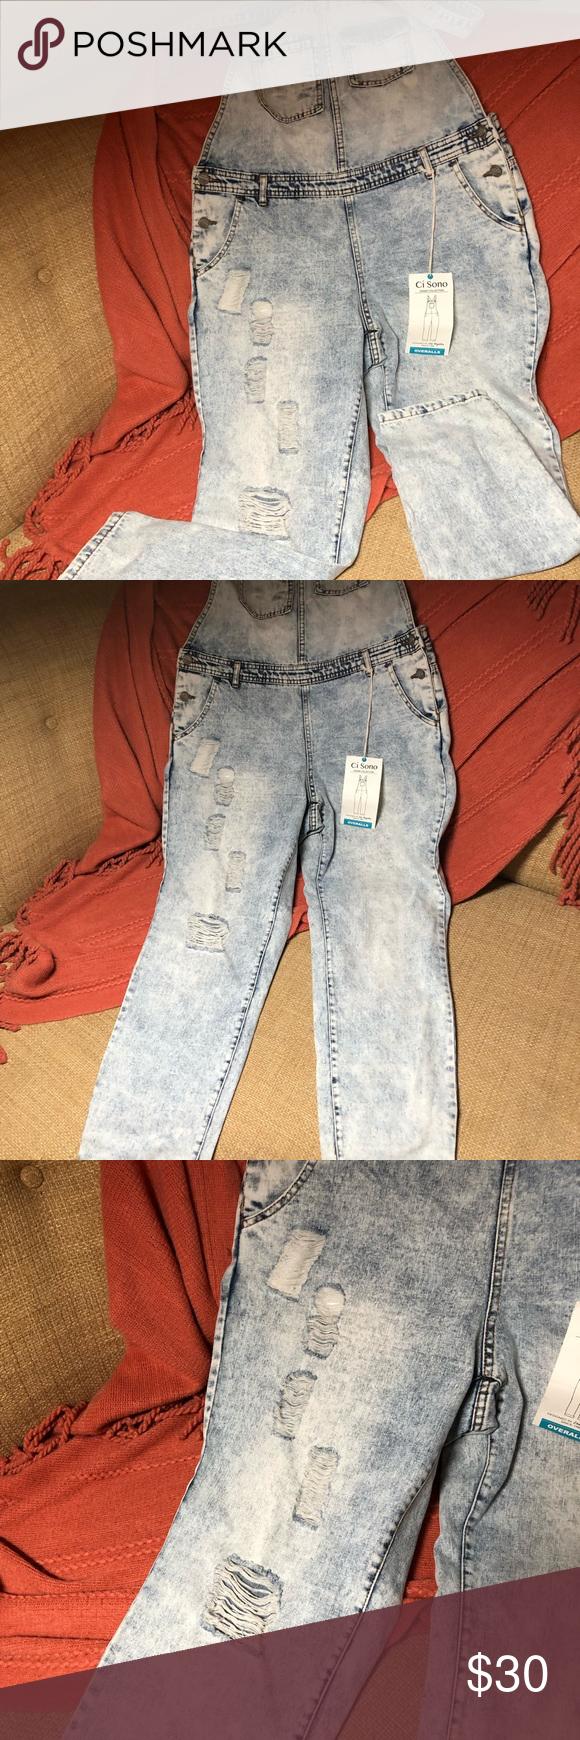 Women Junior Denim jumper Blue Jumpsuit Romper Overall Ci sono ripped Stylish L